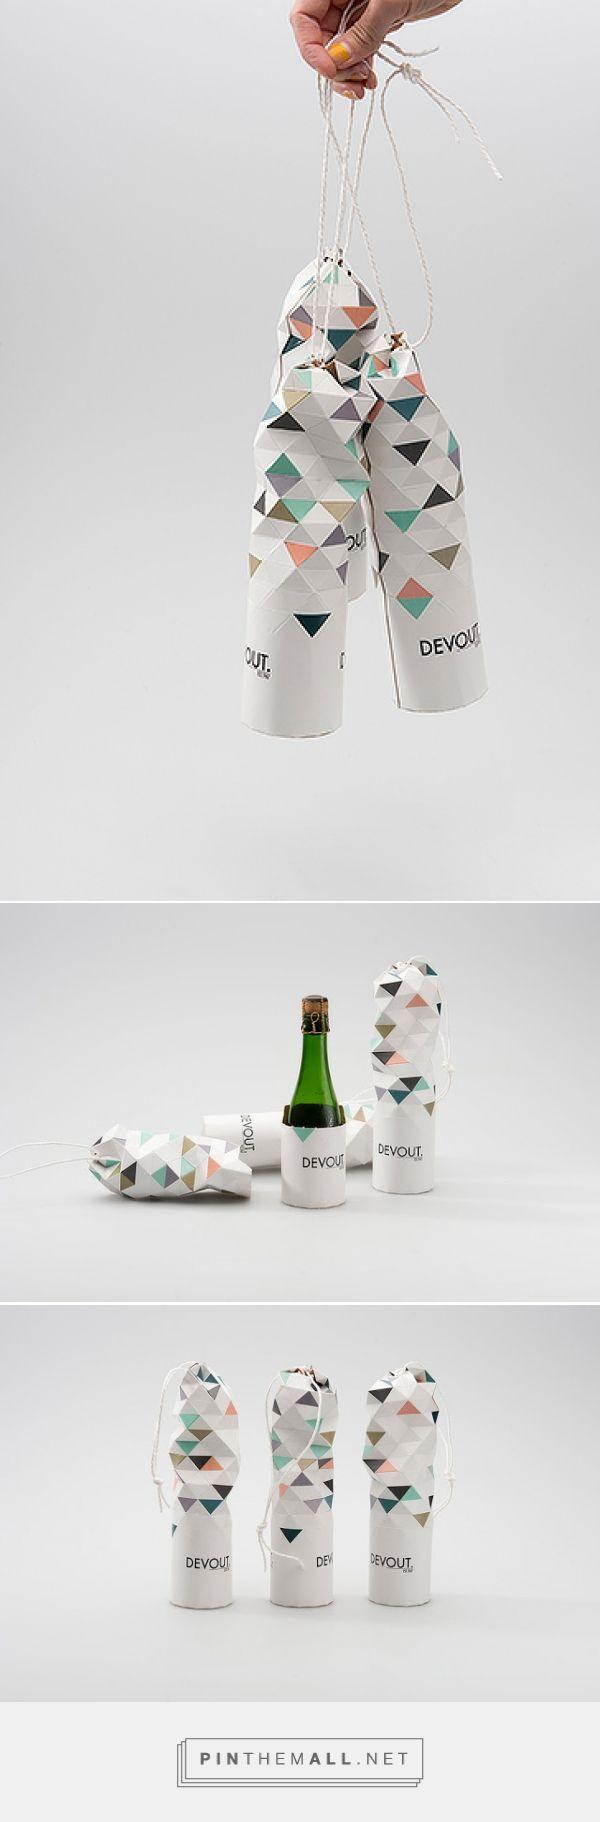 DEVOUT #Champagne #Concept #packaging designed by Jessica Sjöstedt - http://www.packagingoftheworld.com/2015/05/devout-champagne-concept.html